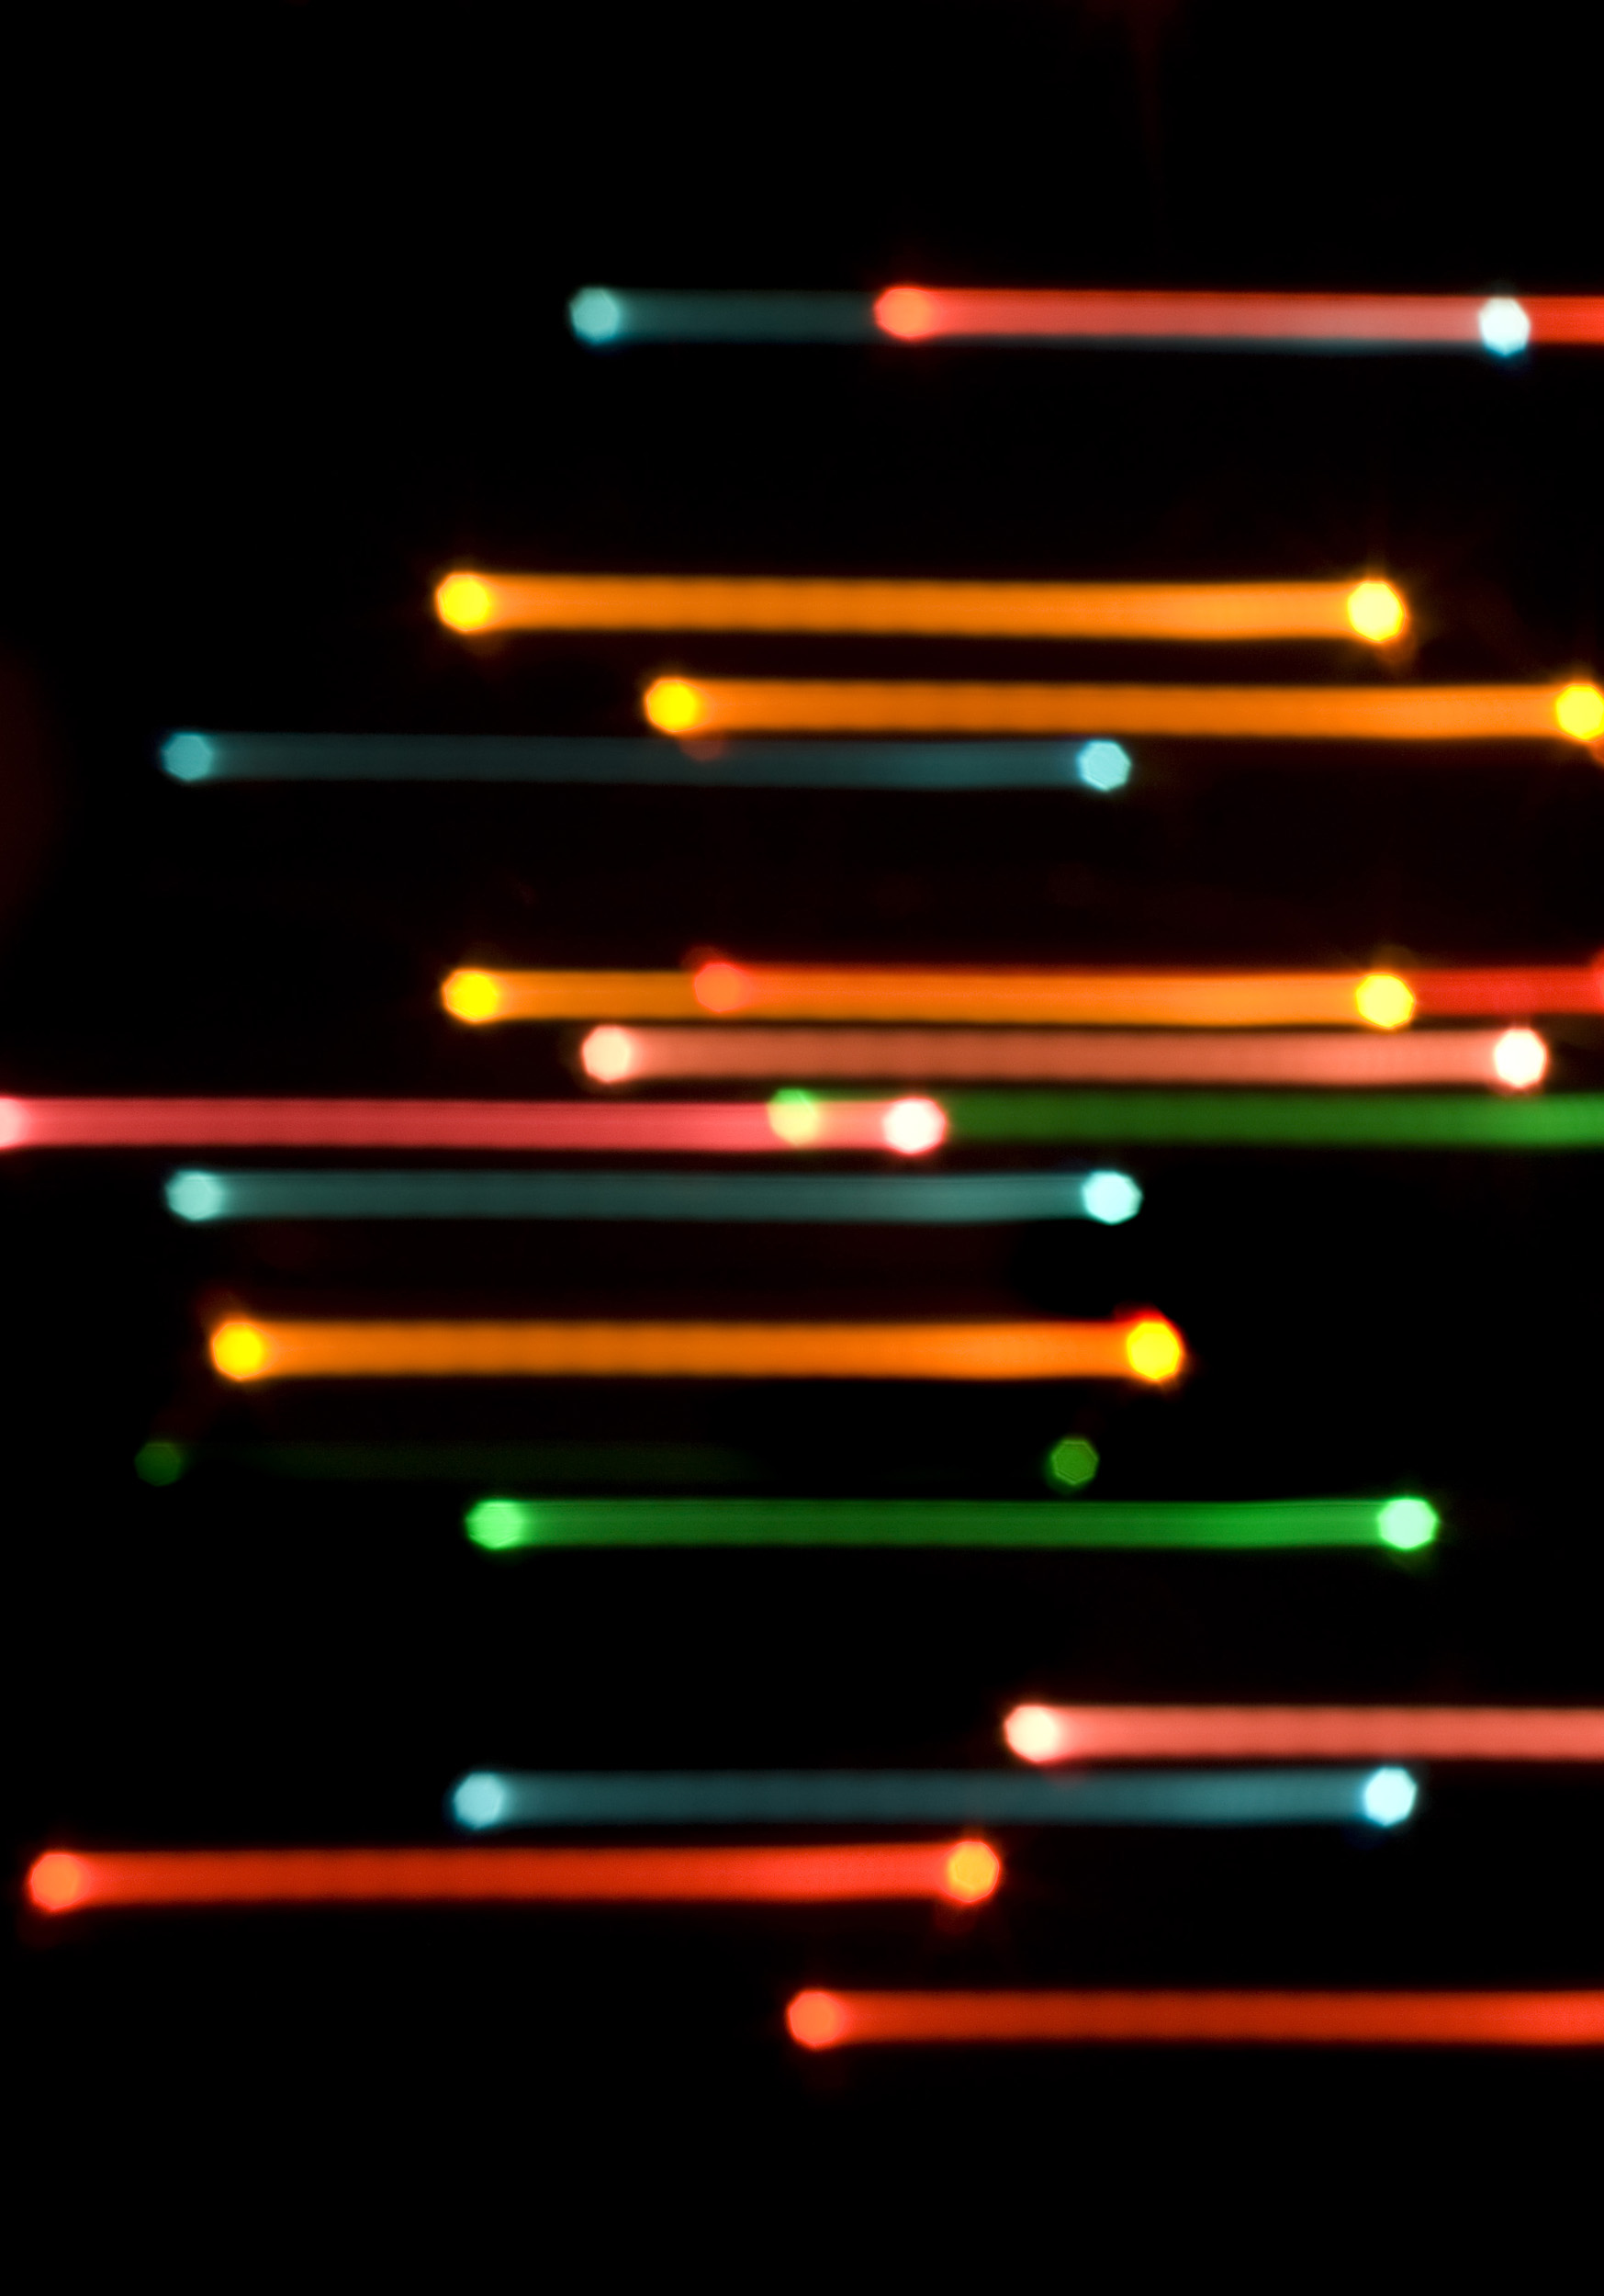 Free Stock Photo 1840 Horizontal Light Lines Freeimageslive